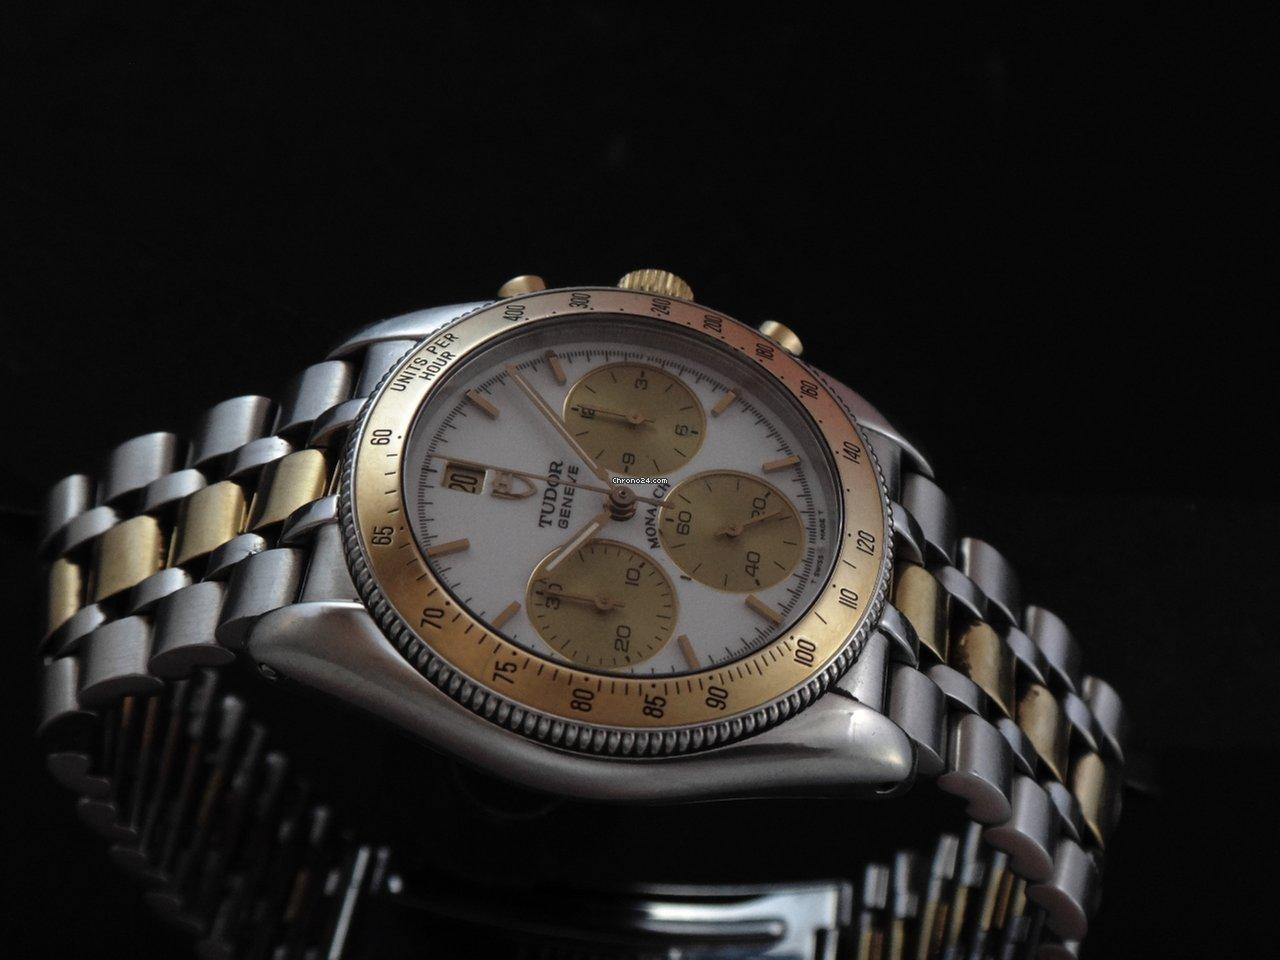 Tudor monarch steel gold chronograph sold on chrono24 for Tudor signatures